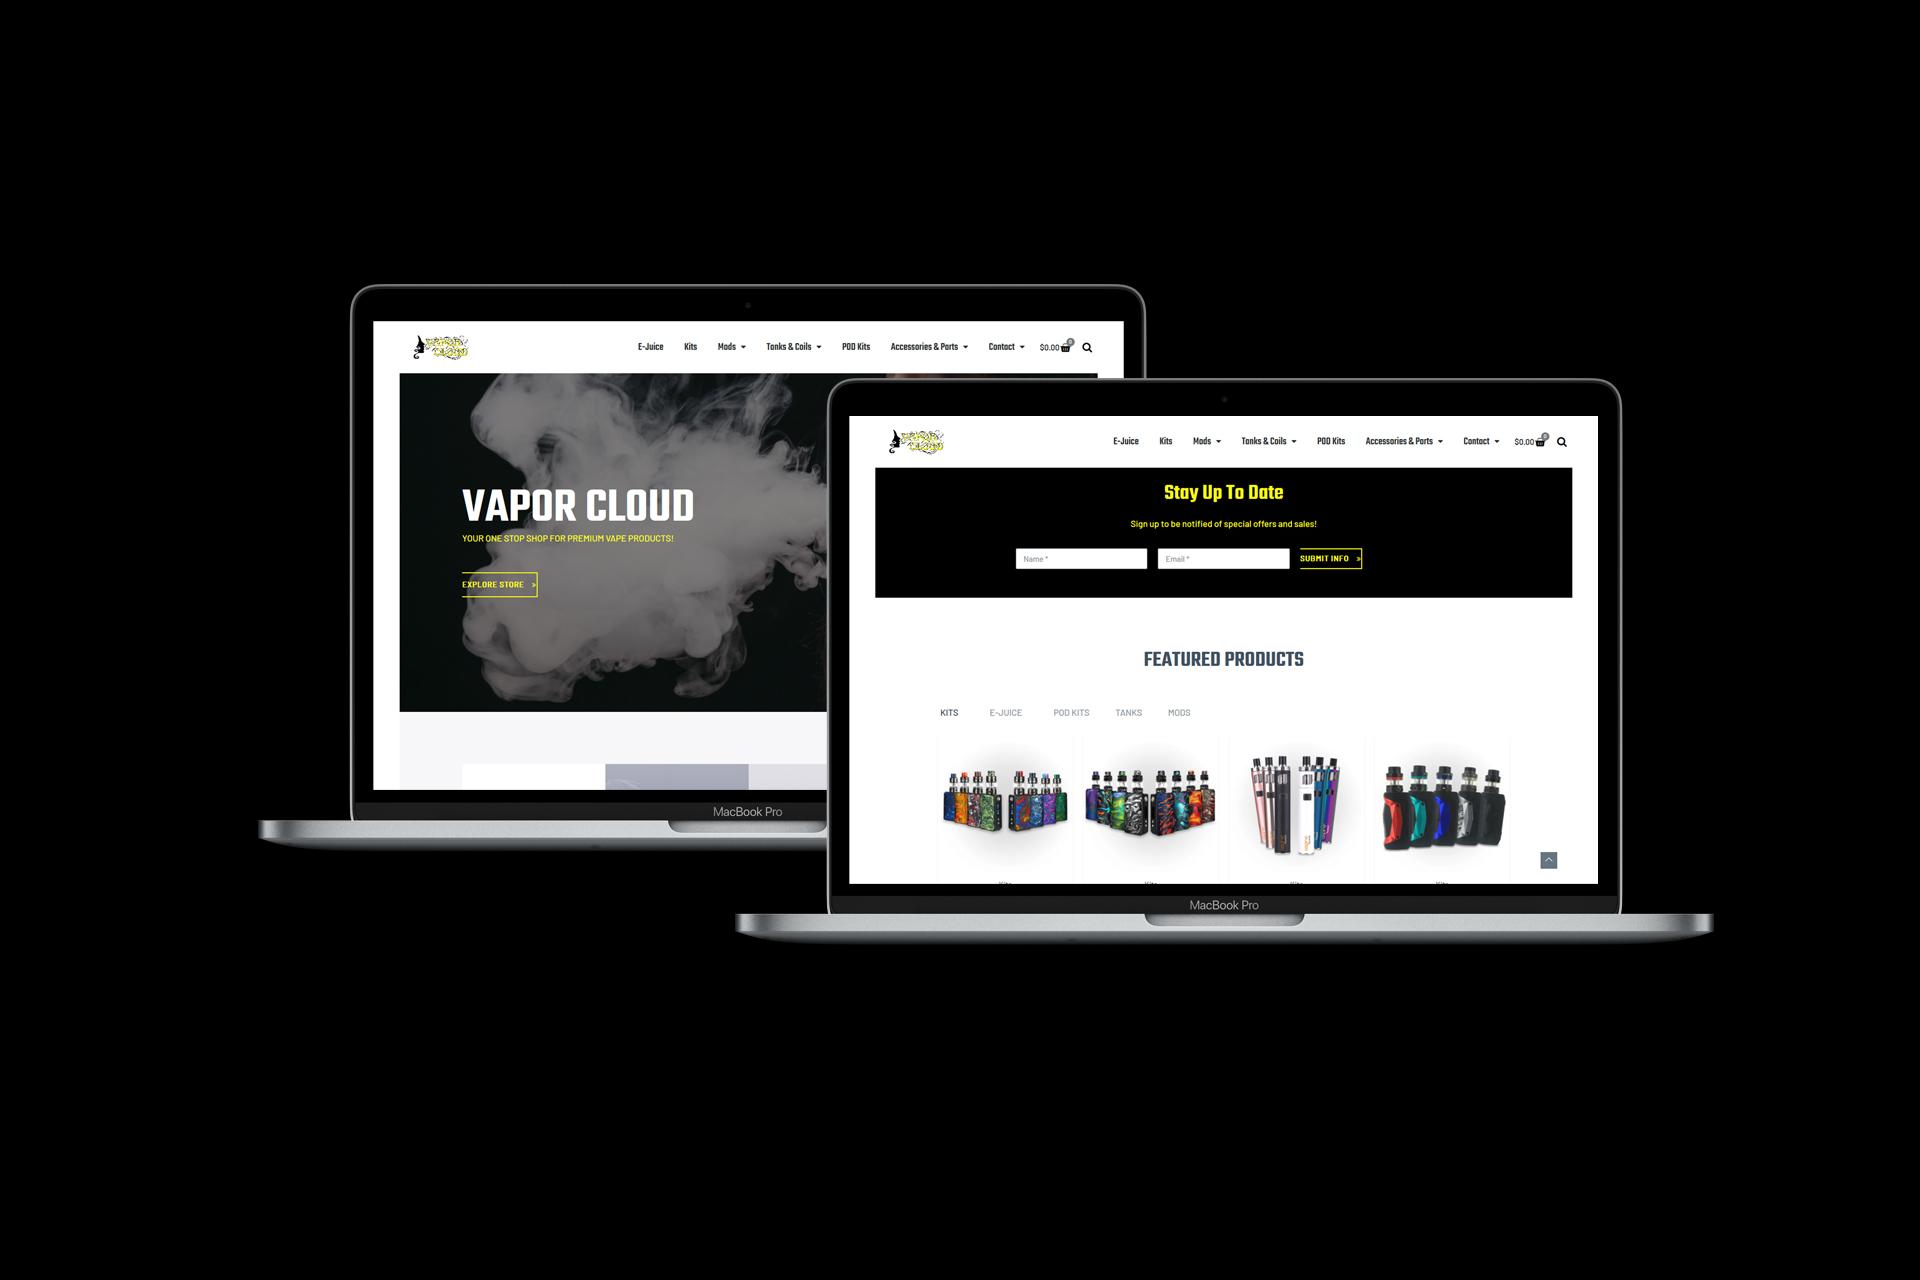 Vapor Cloud desktop website screenshots on MacBooks